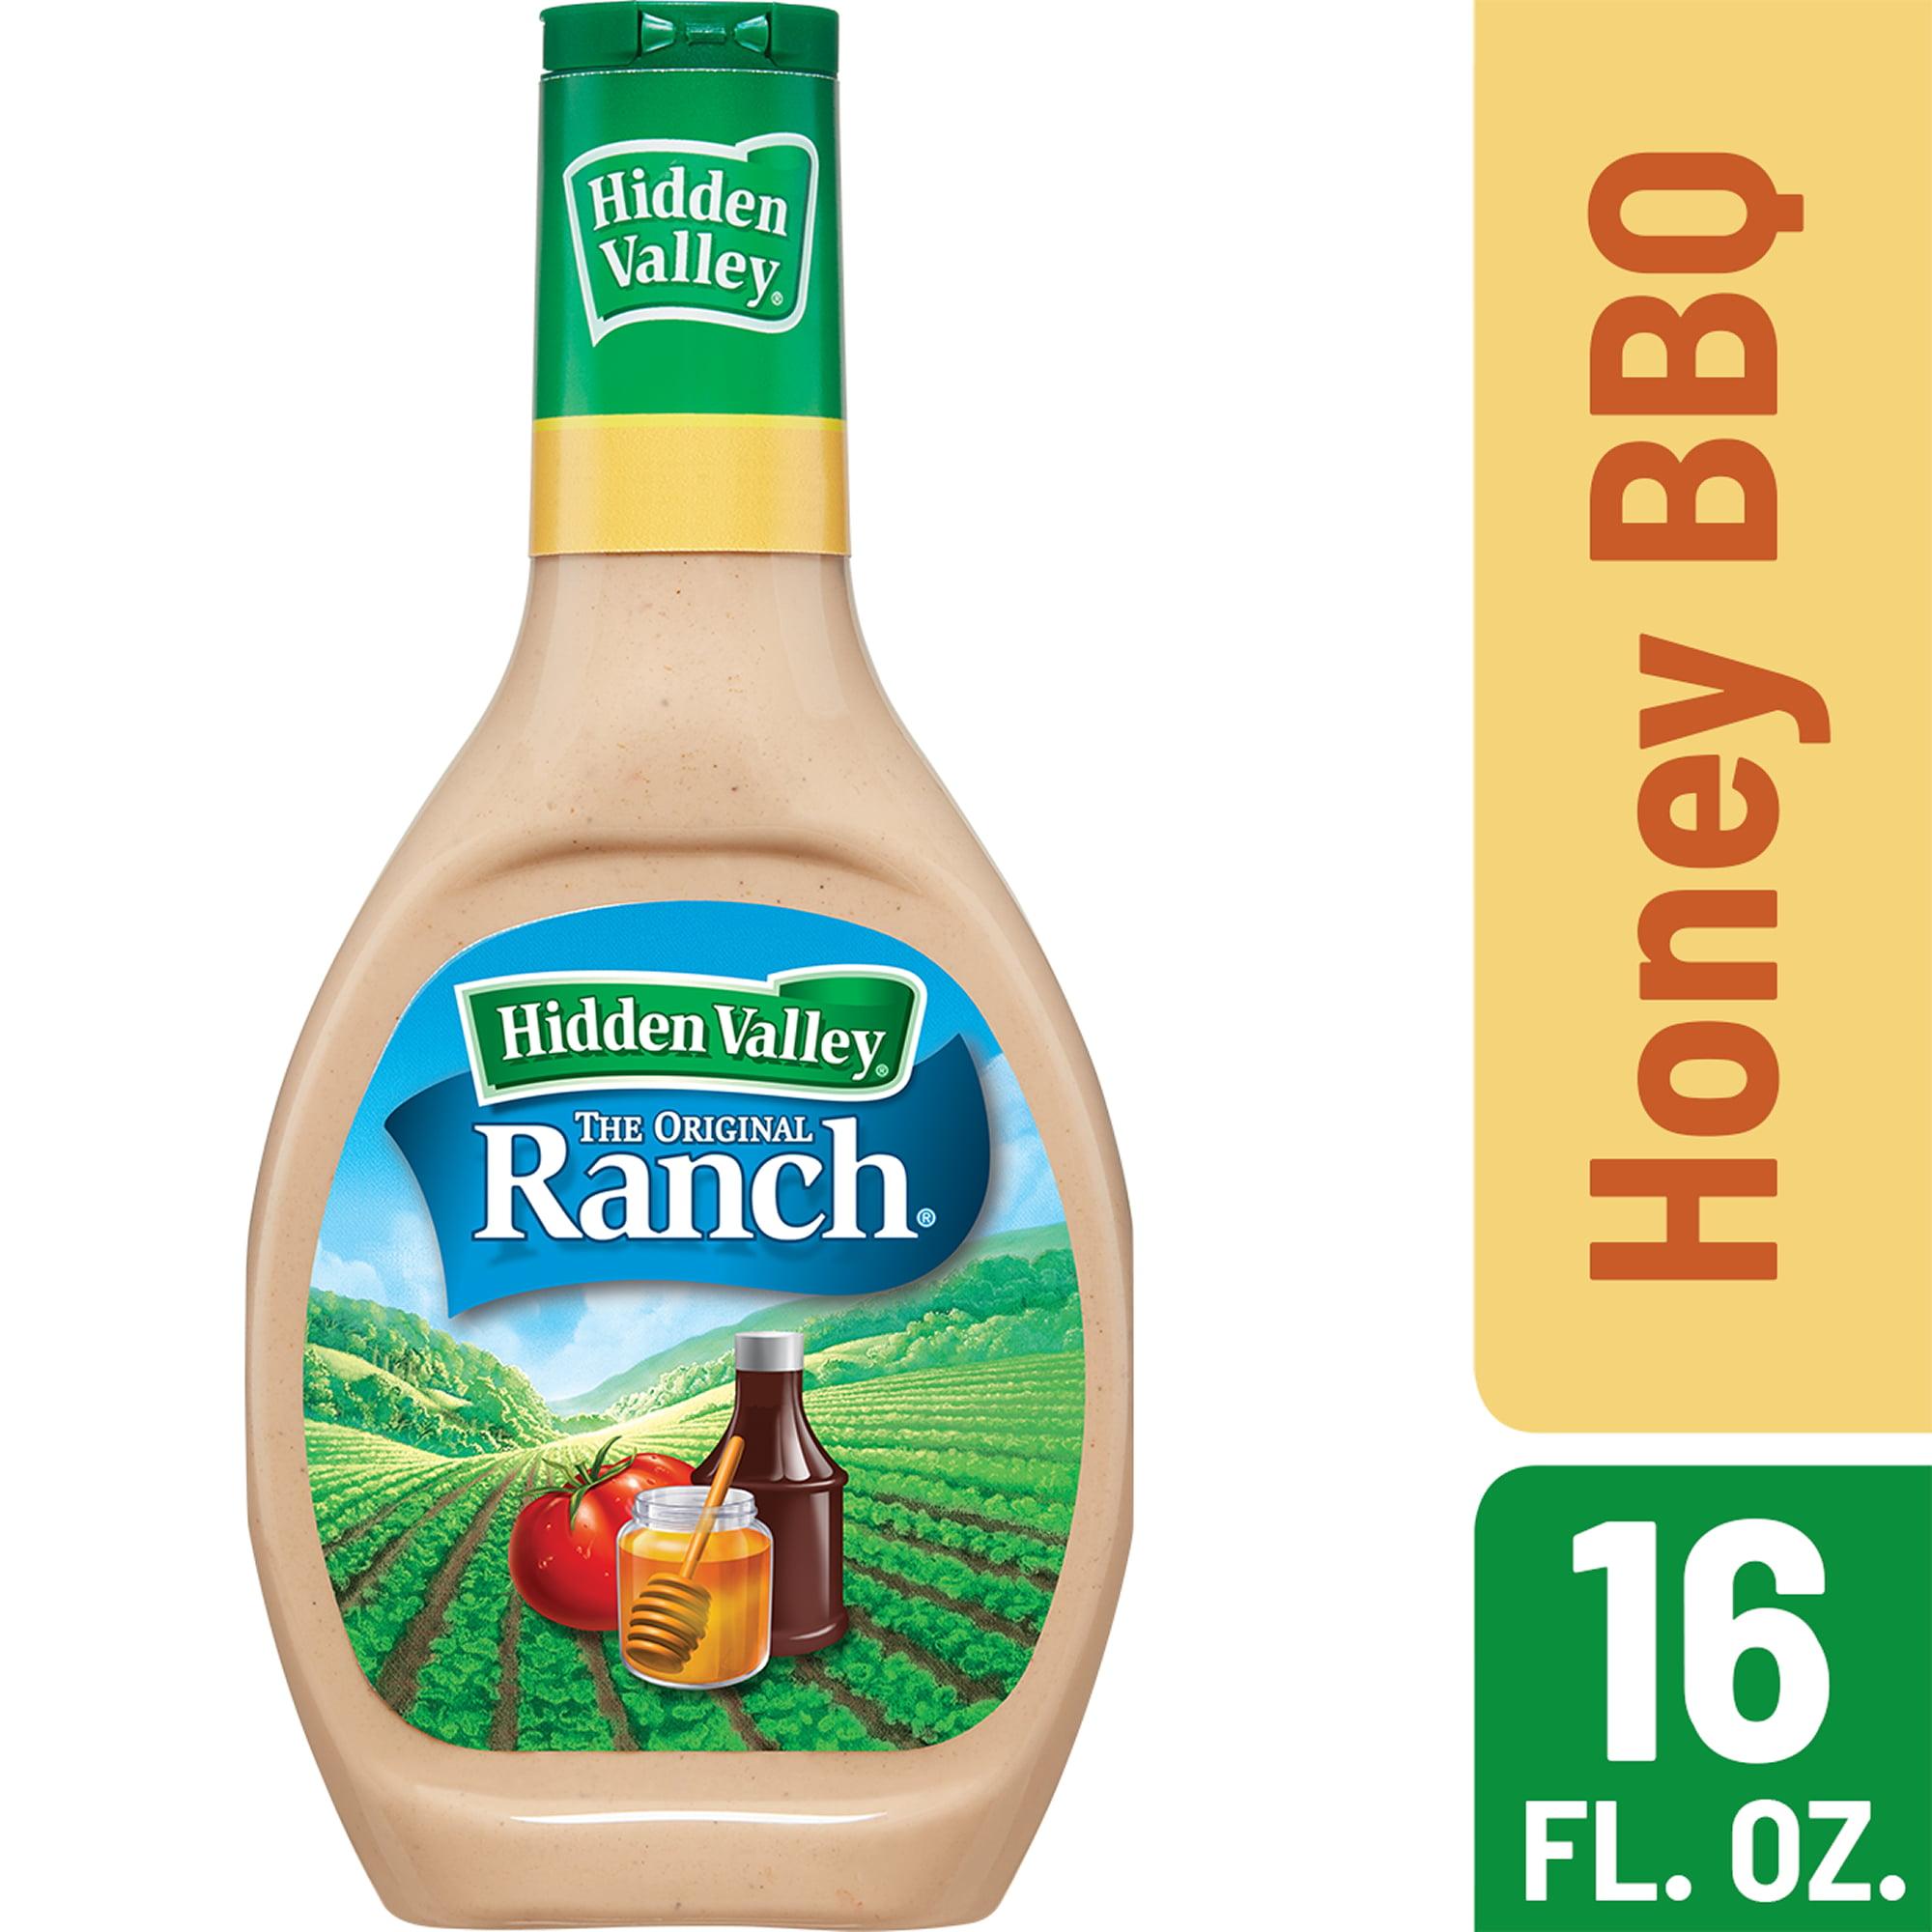 (2 Pack) Hidden Valley Honey BBQ Ranch Salad Dressing & Topping, Gluten Free - 16 oz Bottle